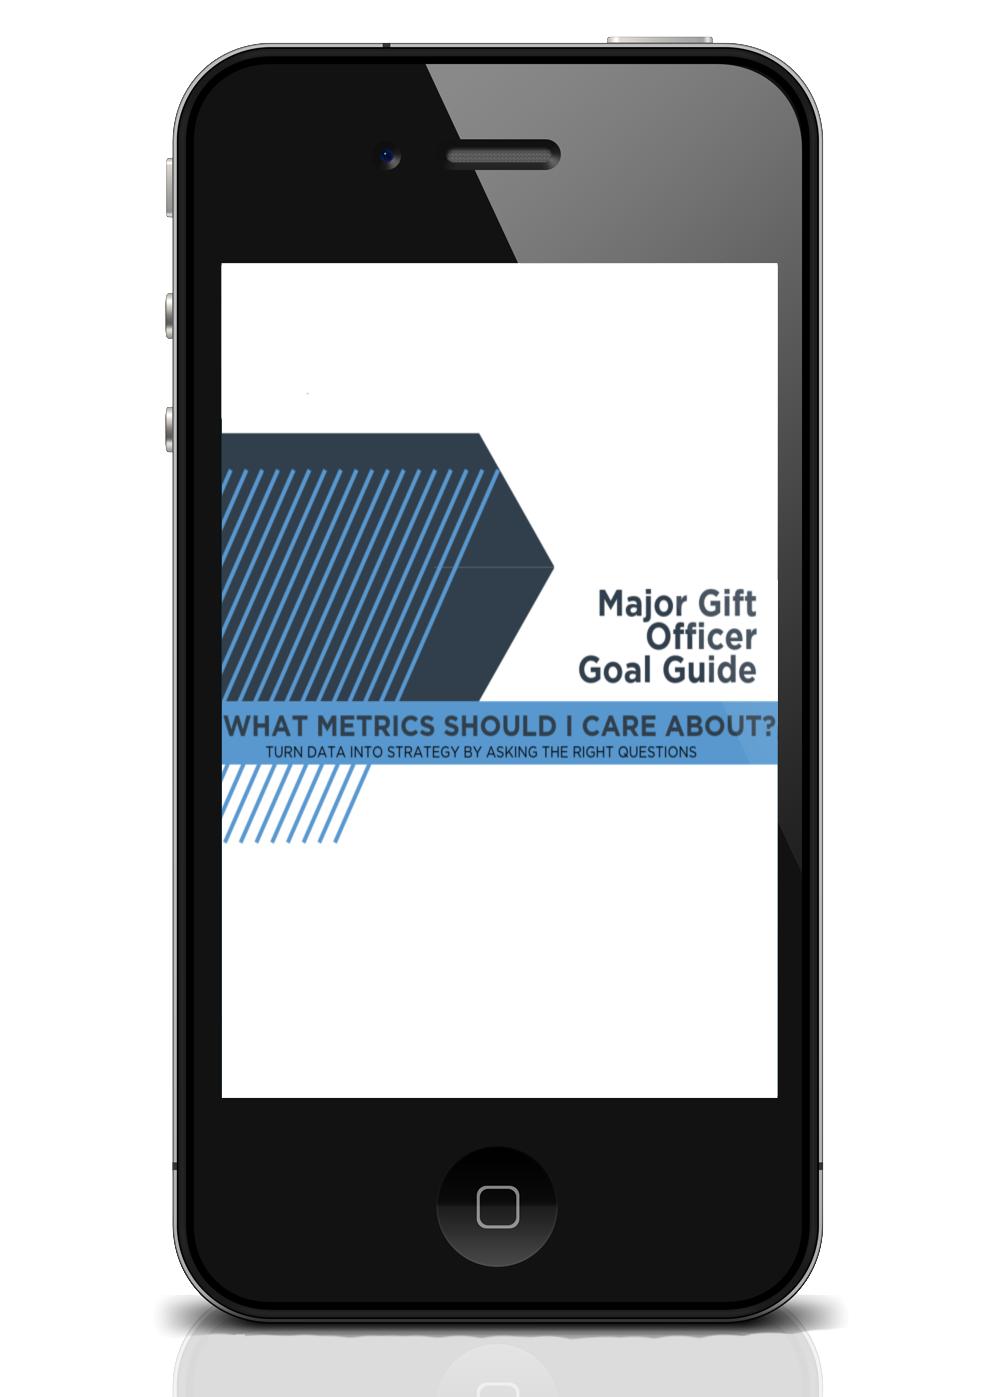 Major Gift Officers Guide